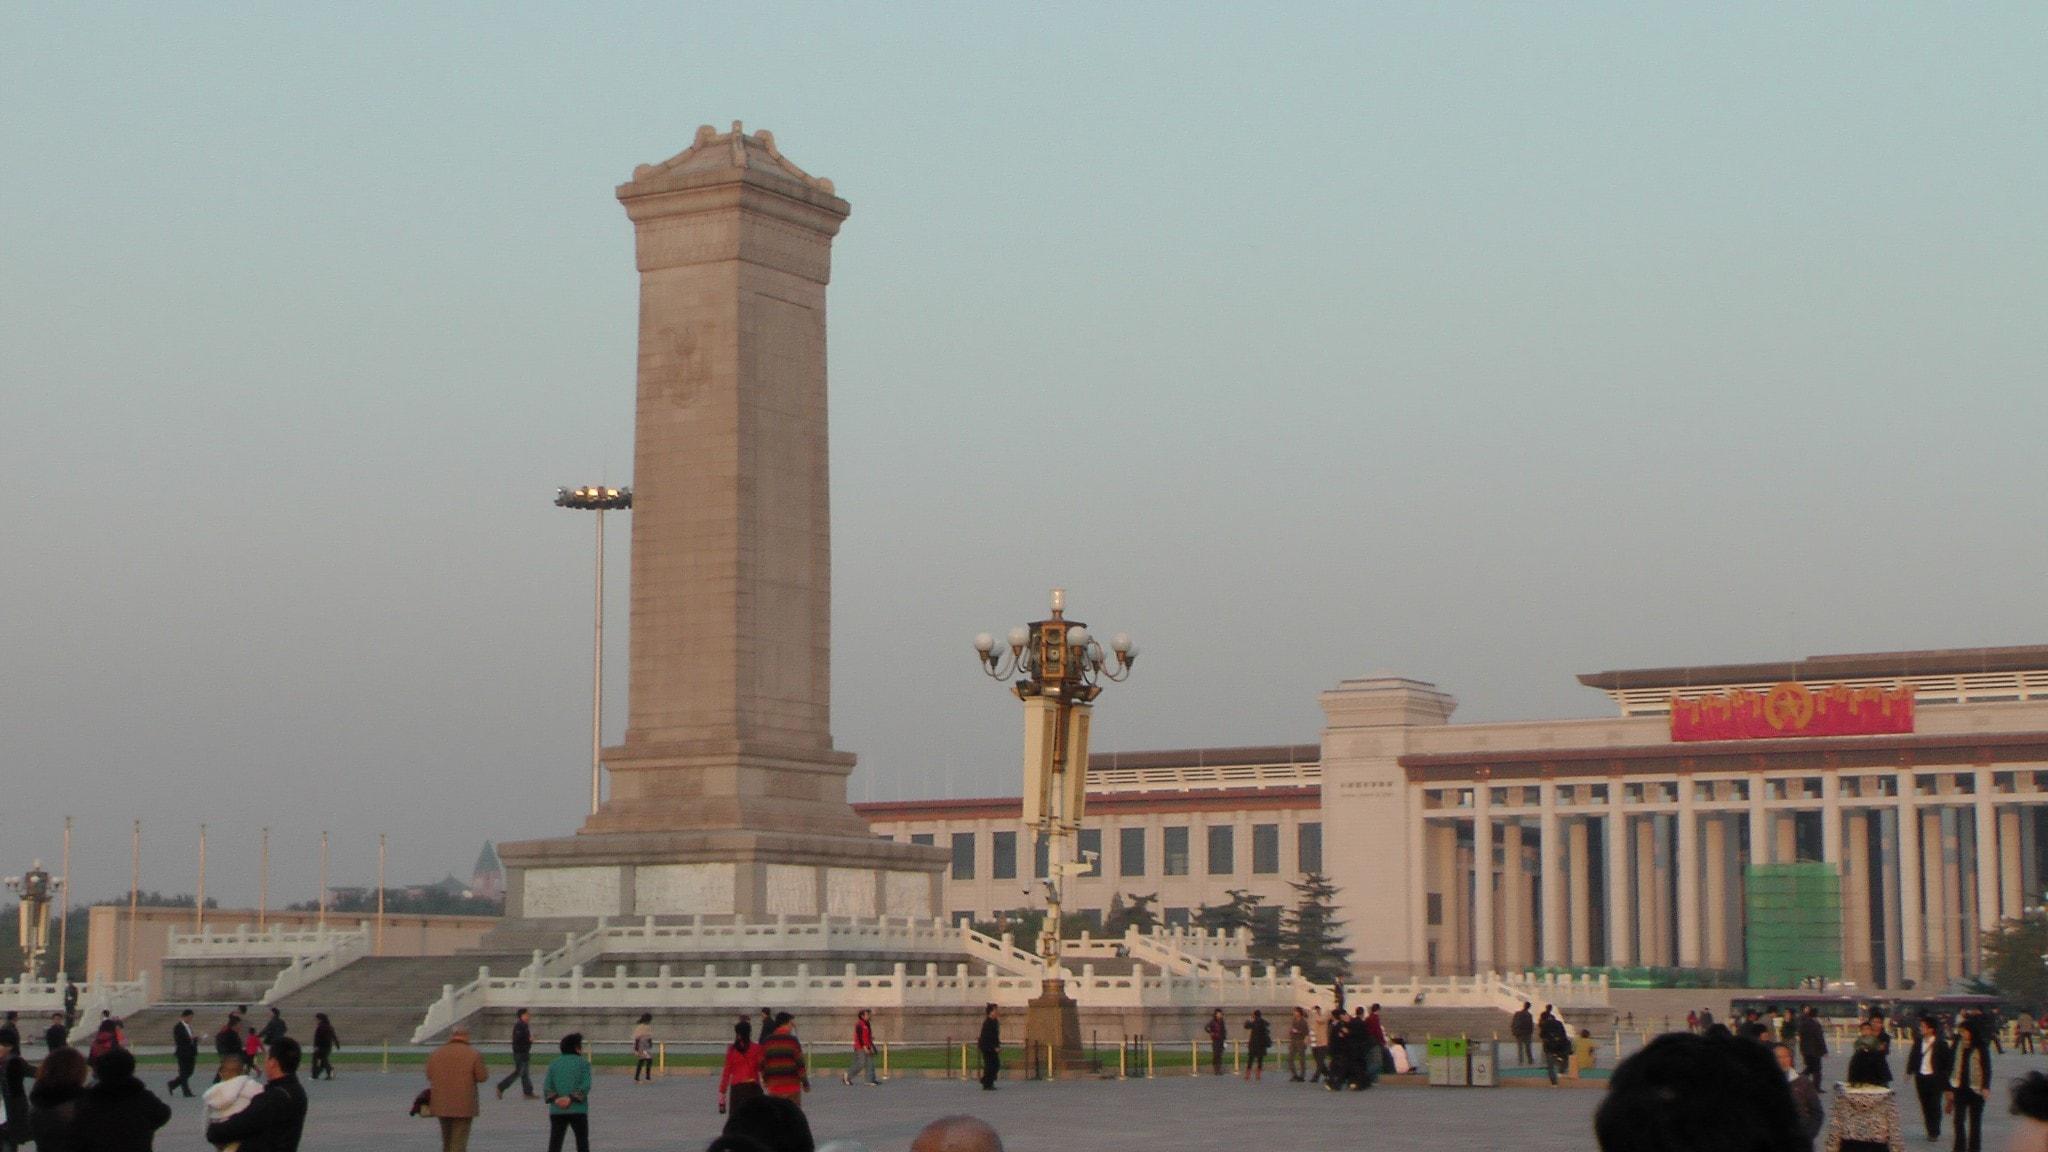 U China Travel, Beijing: Hours, Address, U China Travel Reviews: 5/5